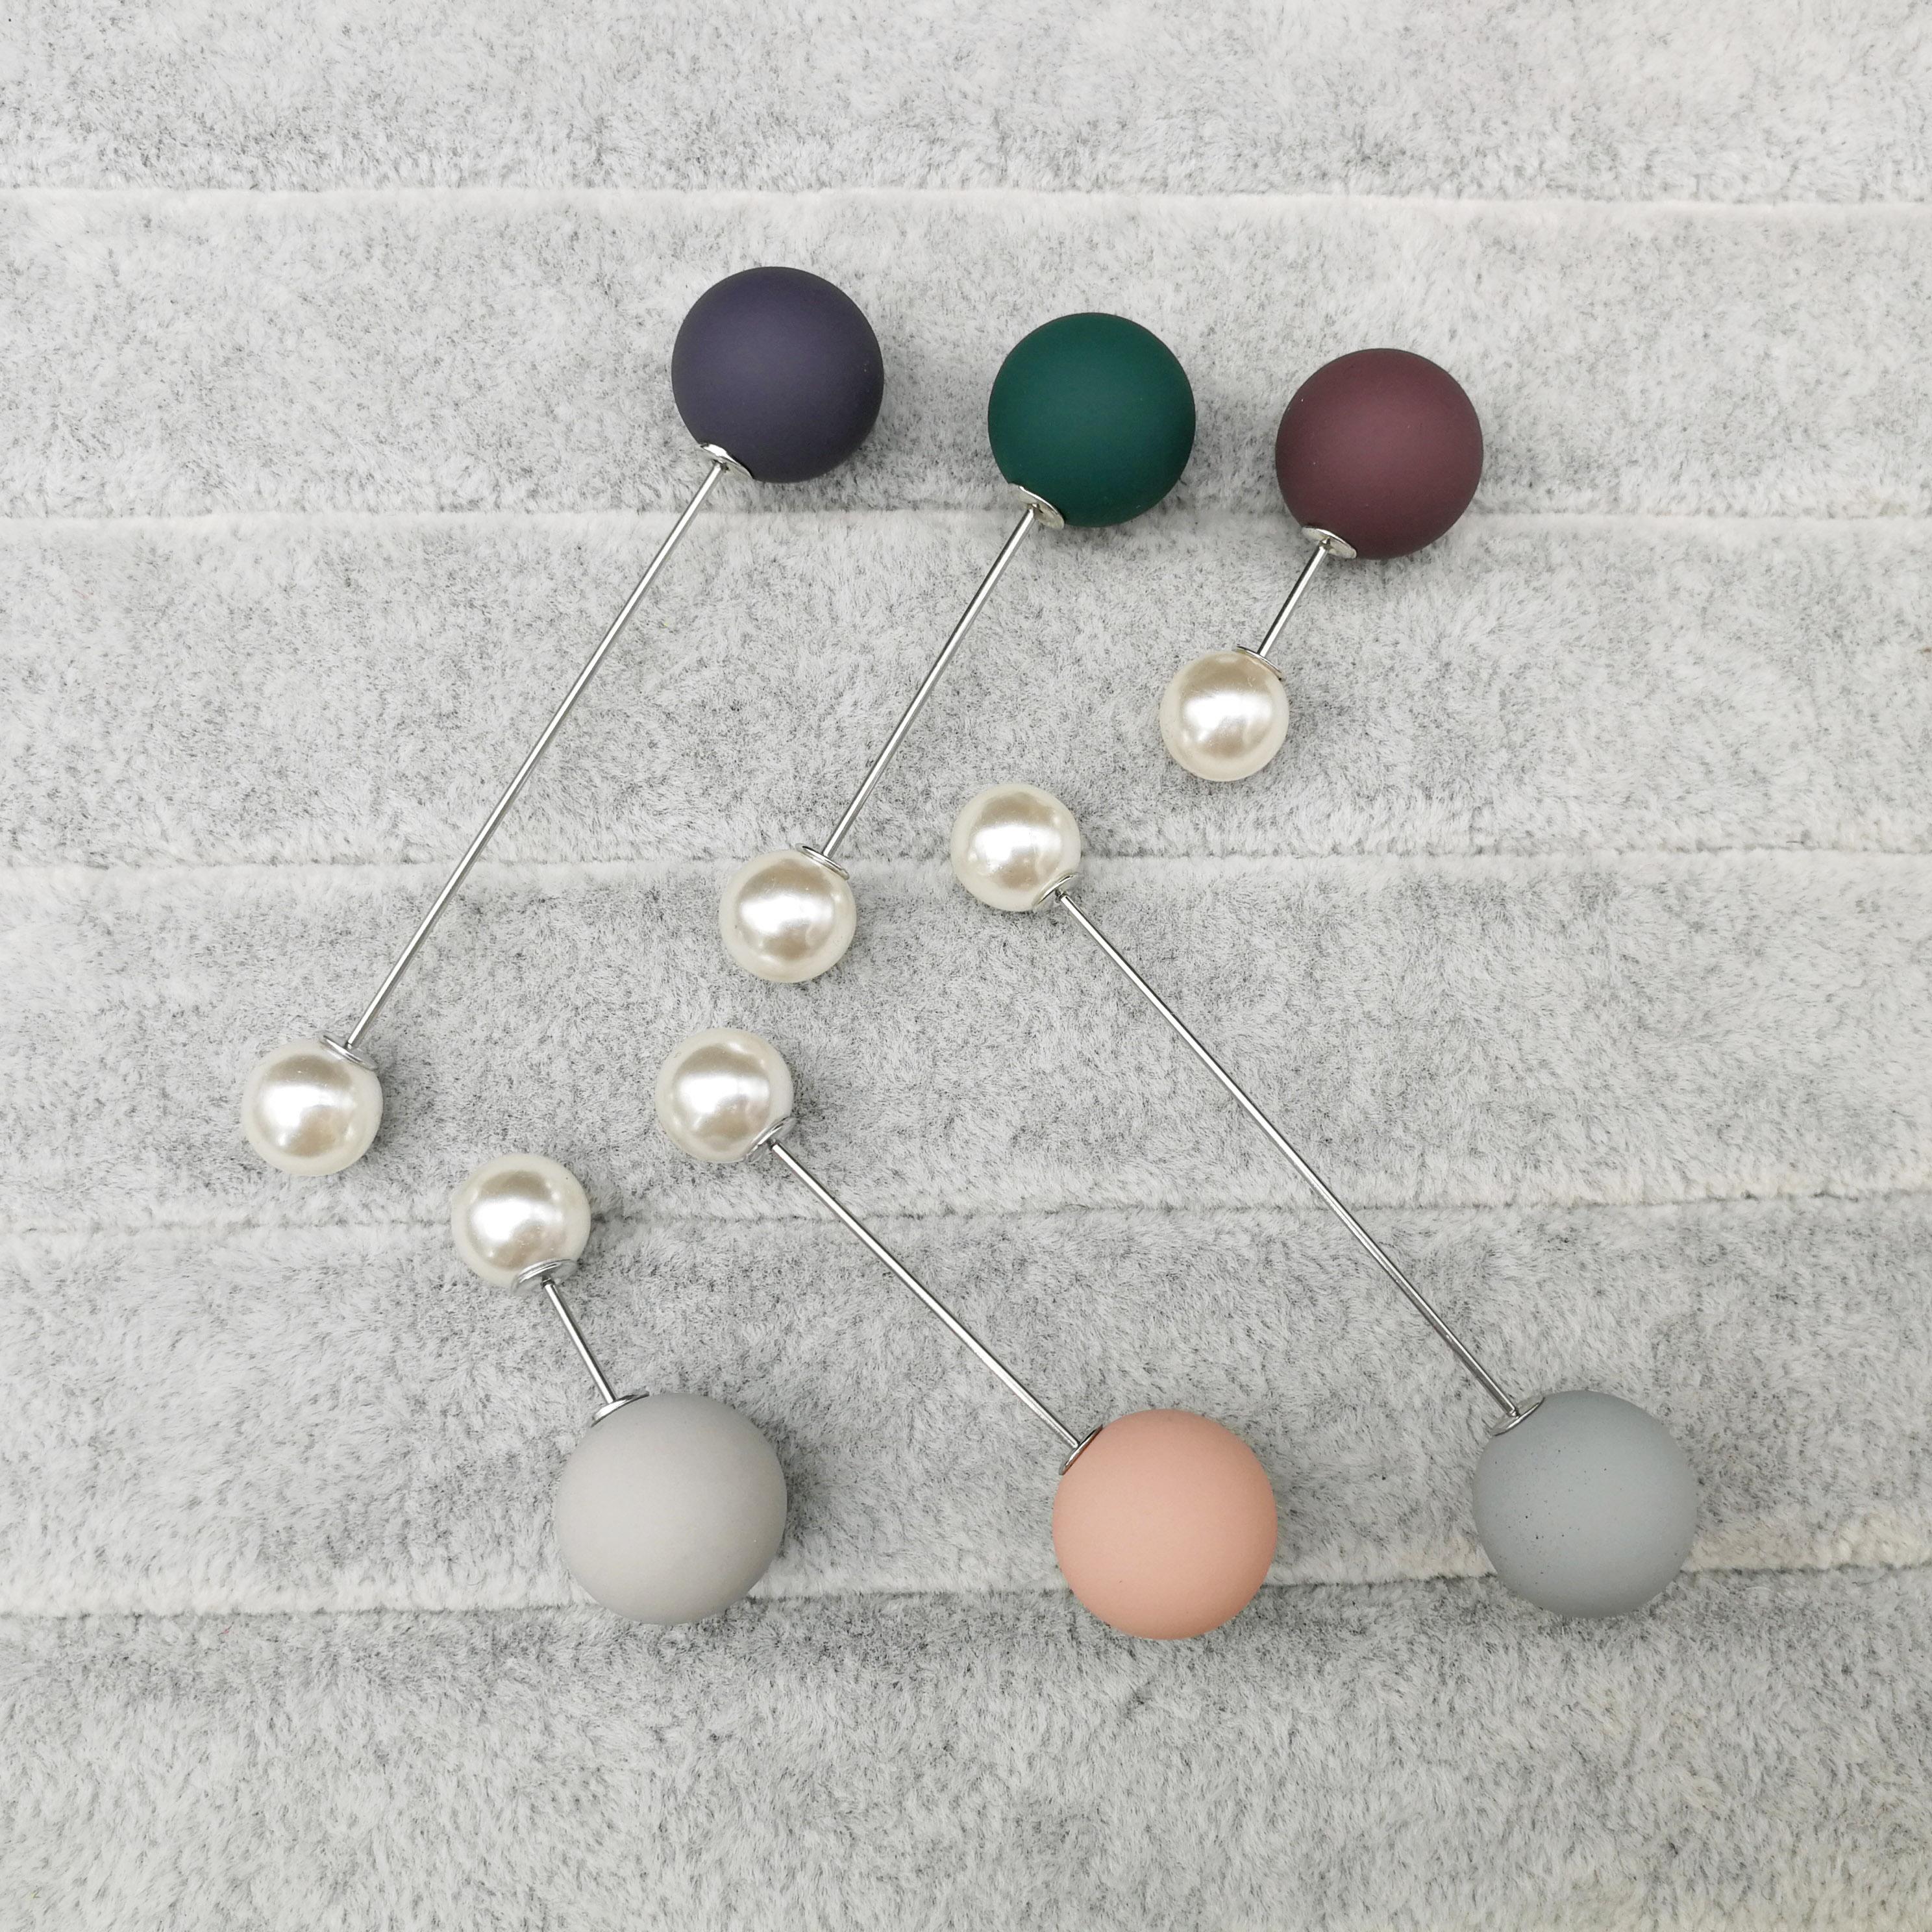 Broche perla simulada doble blanco negro para palillo de mujer bufanda solapa Pin suéter joyería accesorios de moda ropa